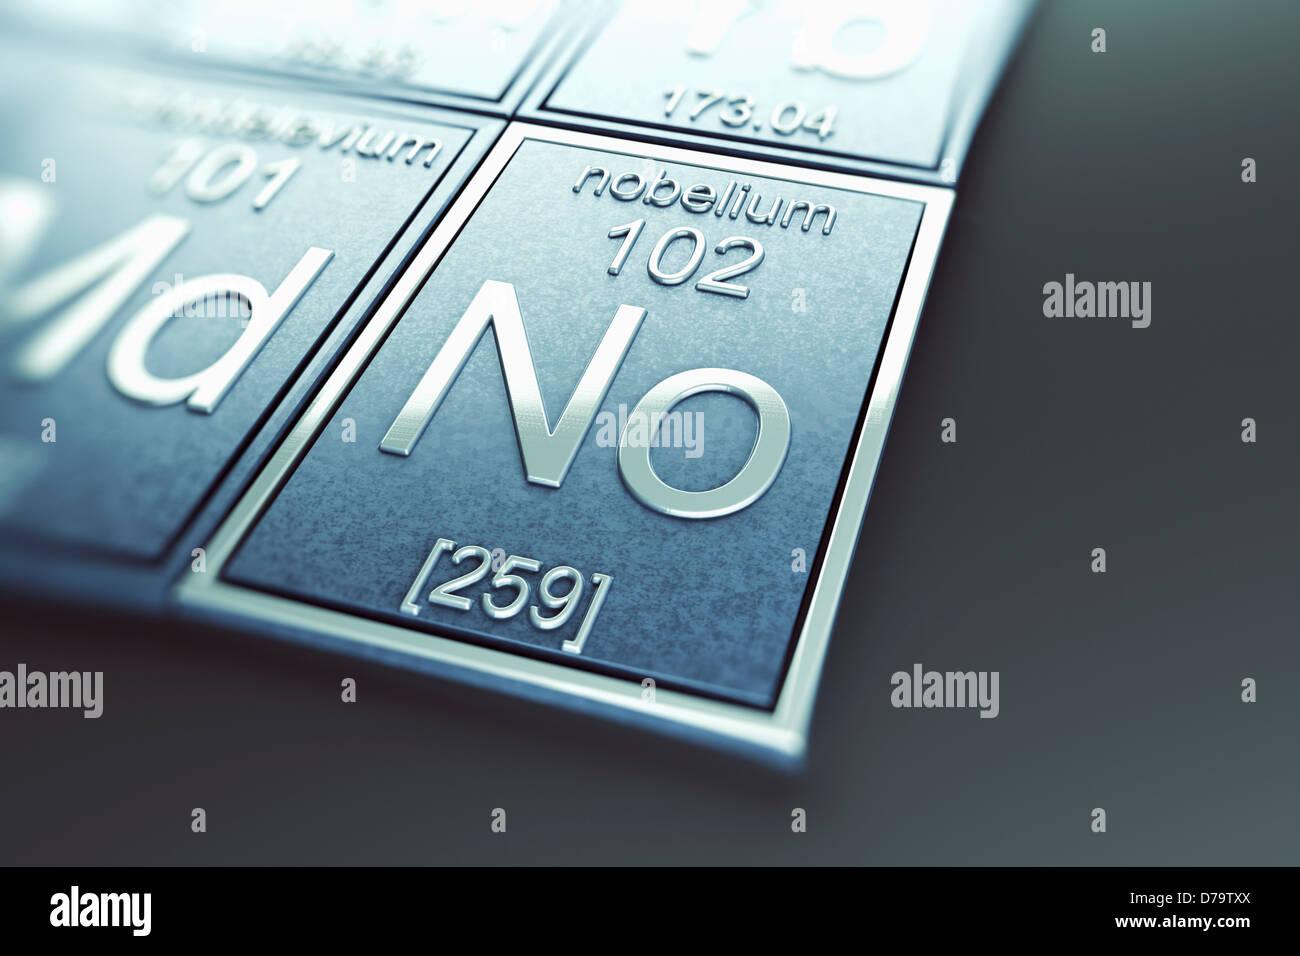 Nobelium chemical element stock photo royalty free image nobelium chemical element buycottarizona